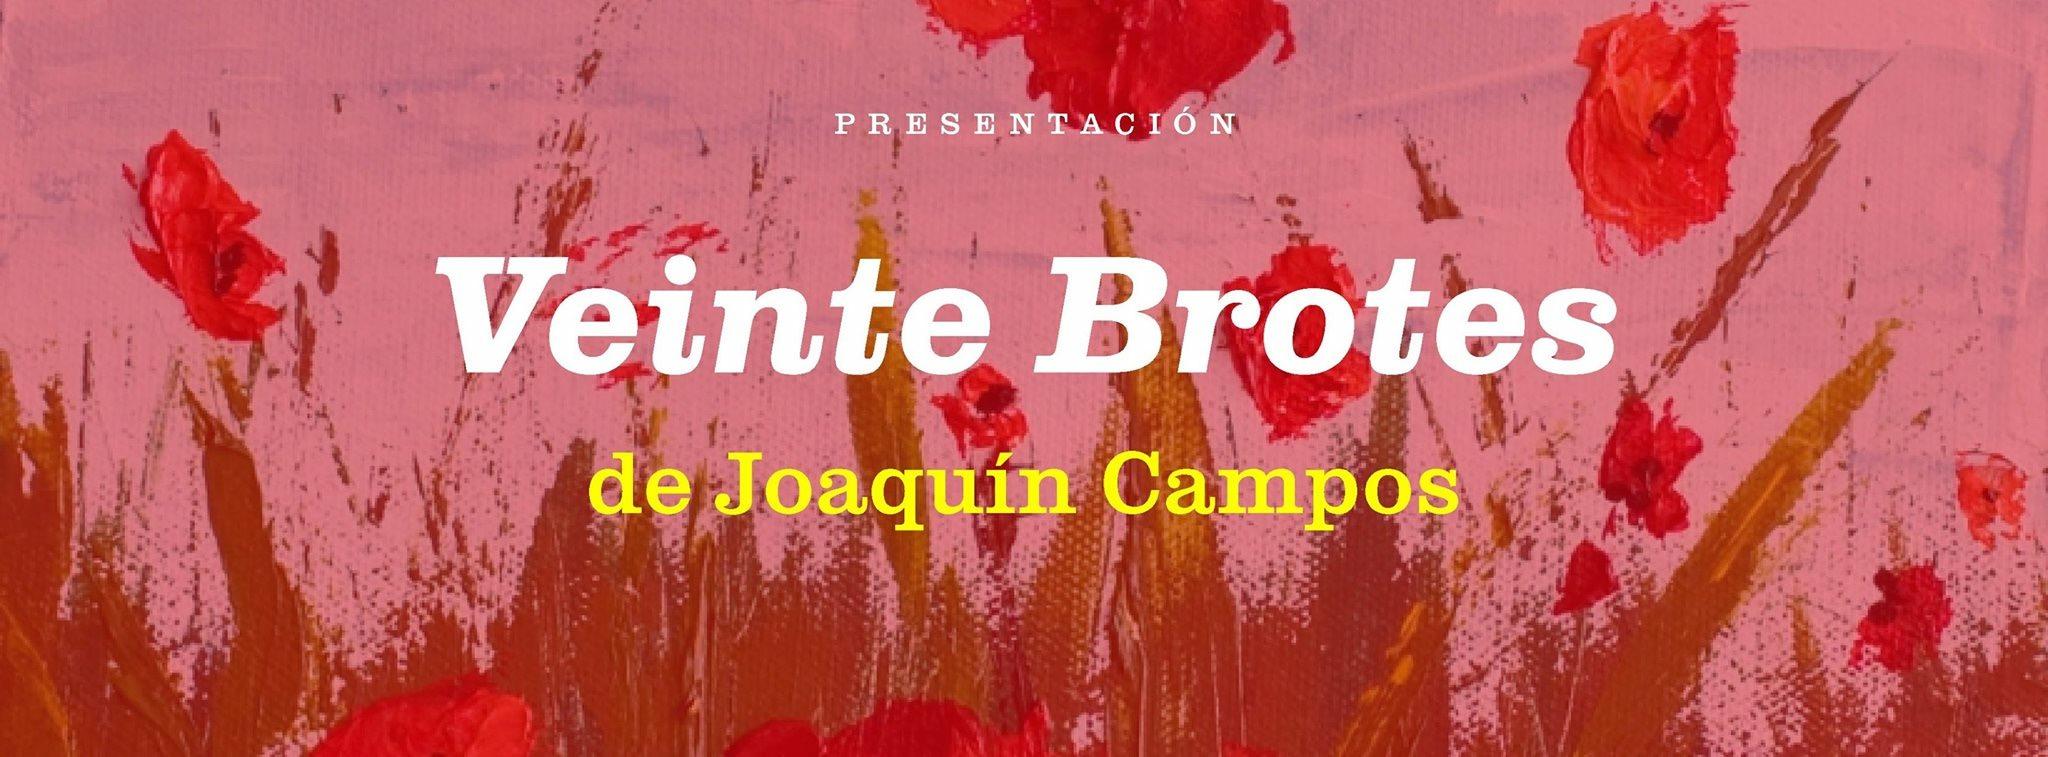 "Presento ""Veinte brotes"" de Joaquín Campos"